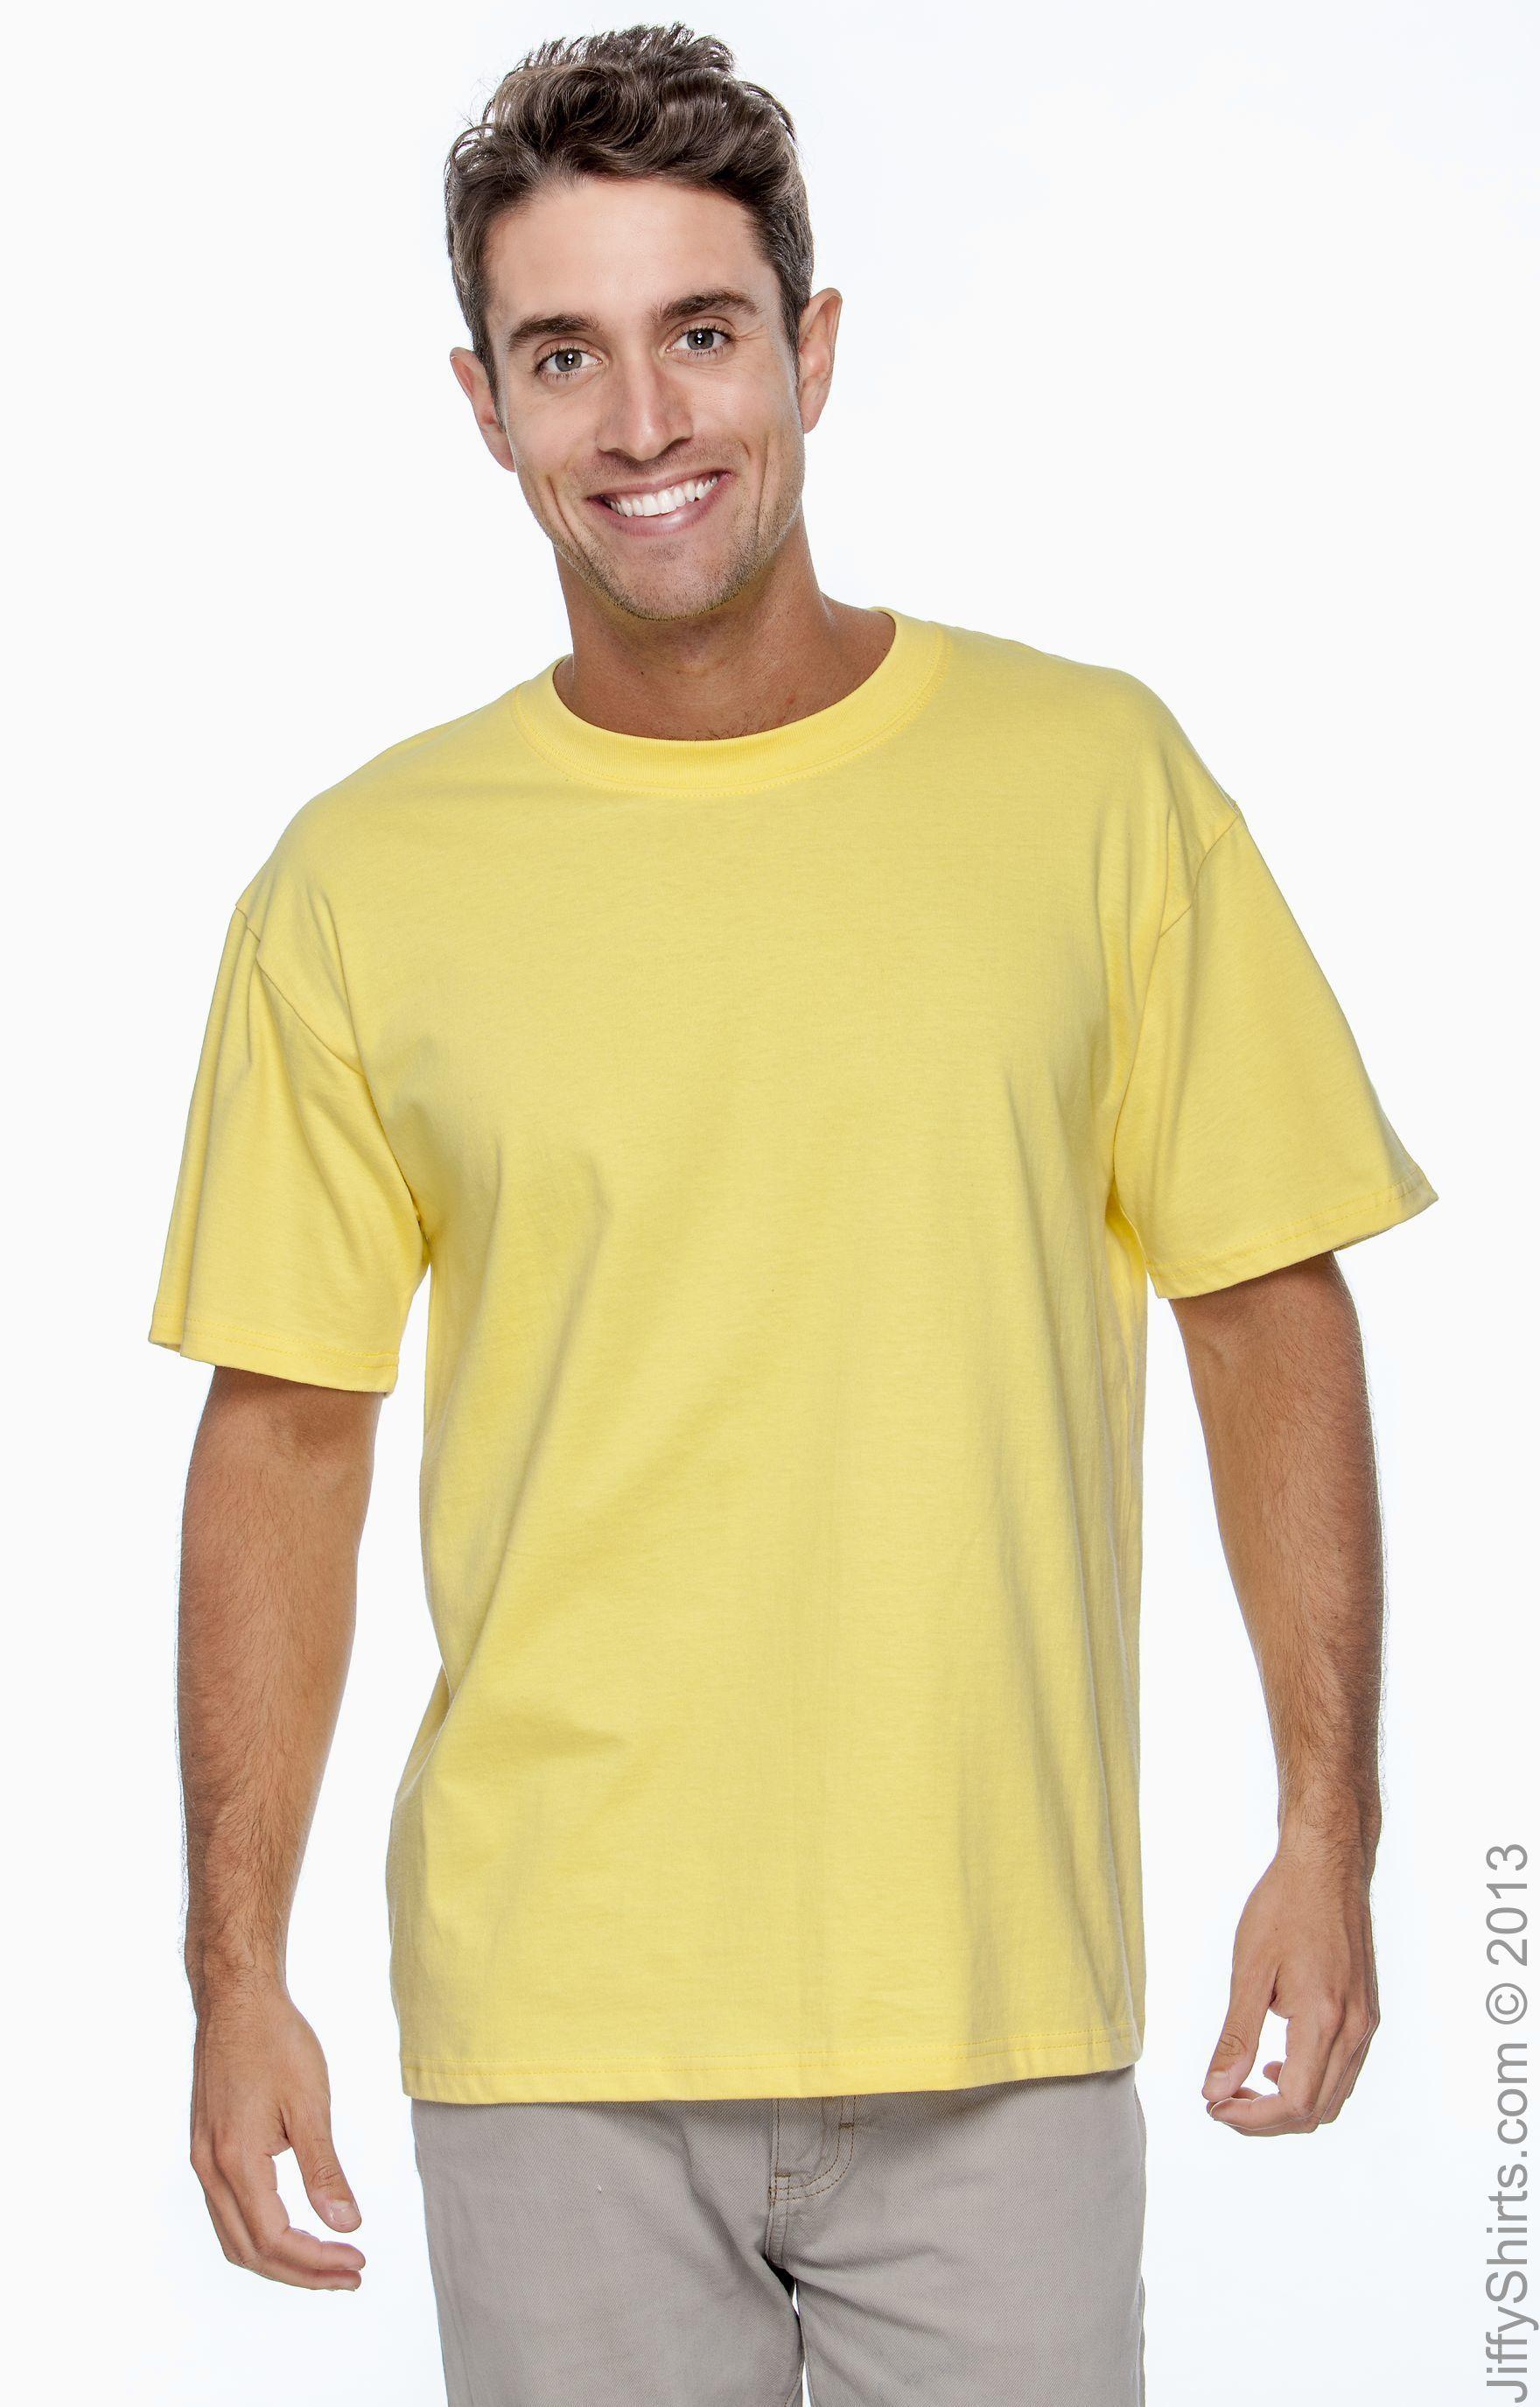 XXXL Hanes Plain BROWN Organic Cotton Tee T-Shirt S